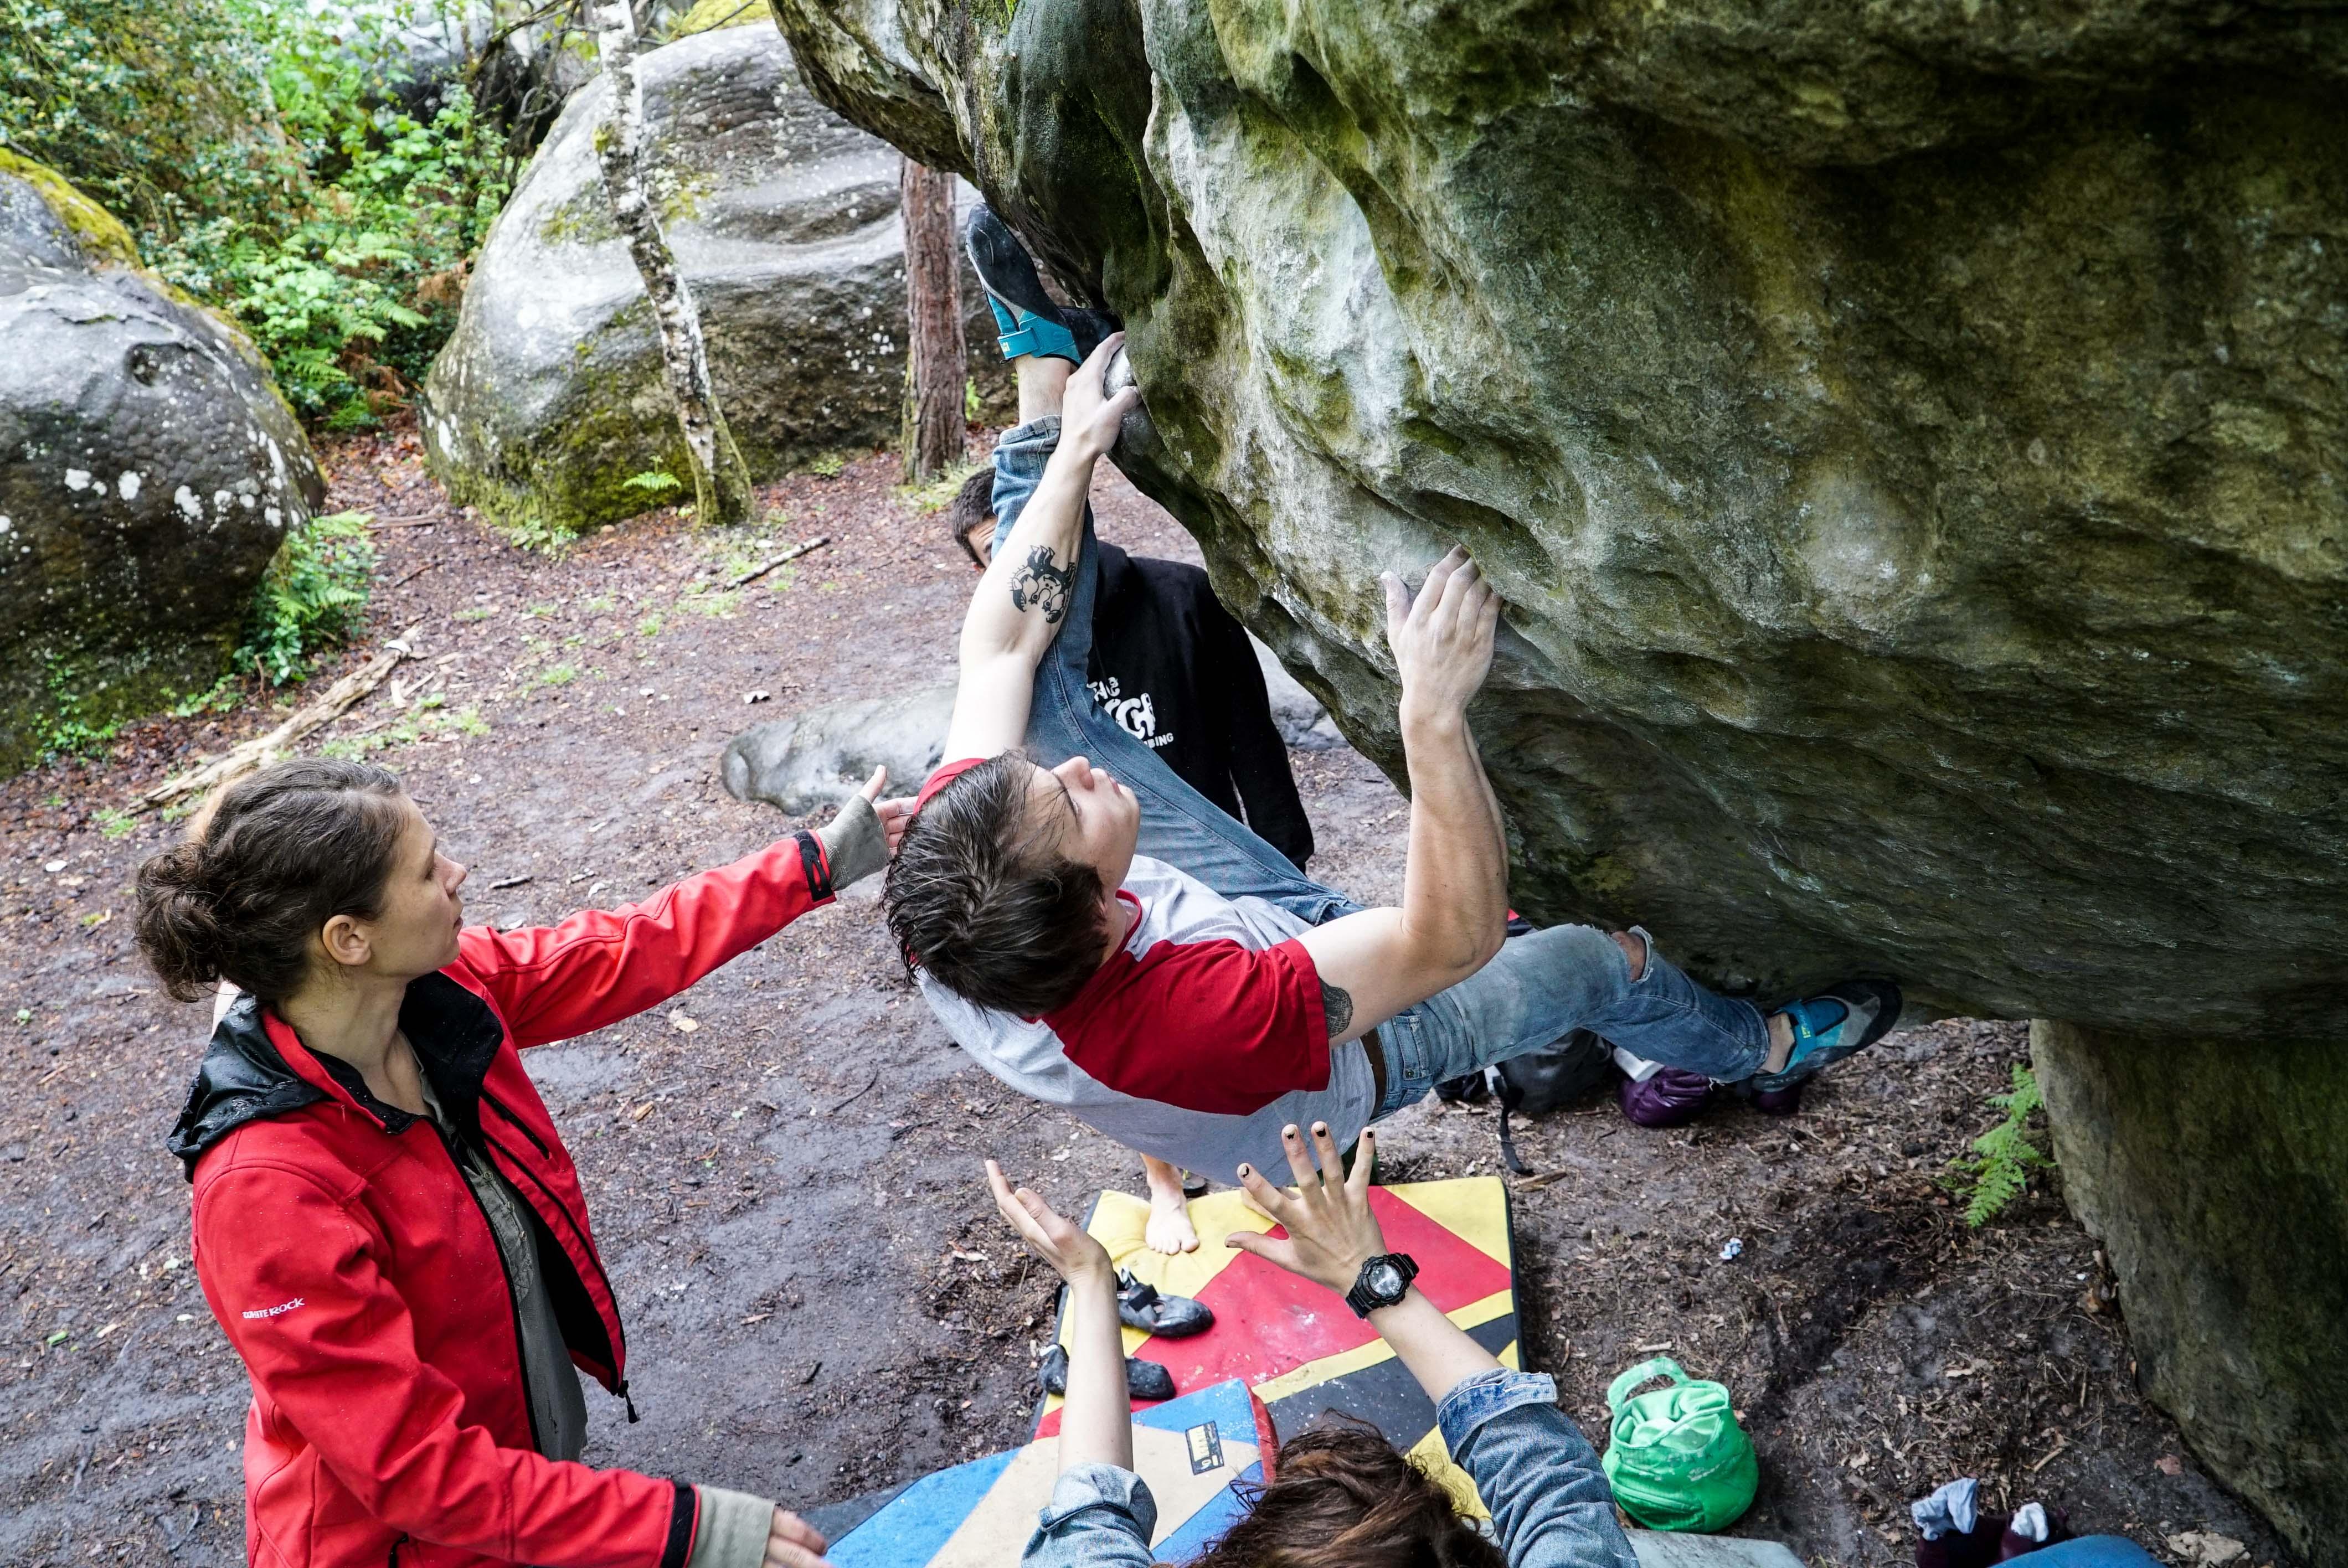 fontainbleau climbing 2016 mike brindley-13